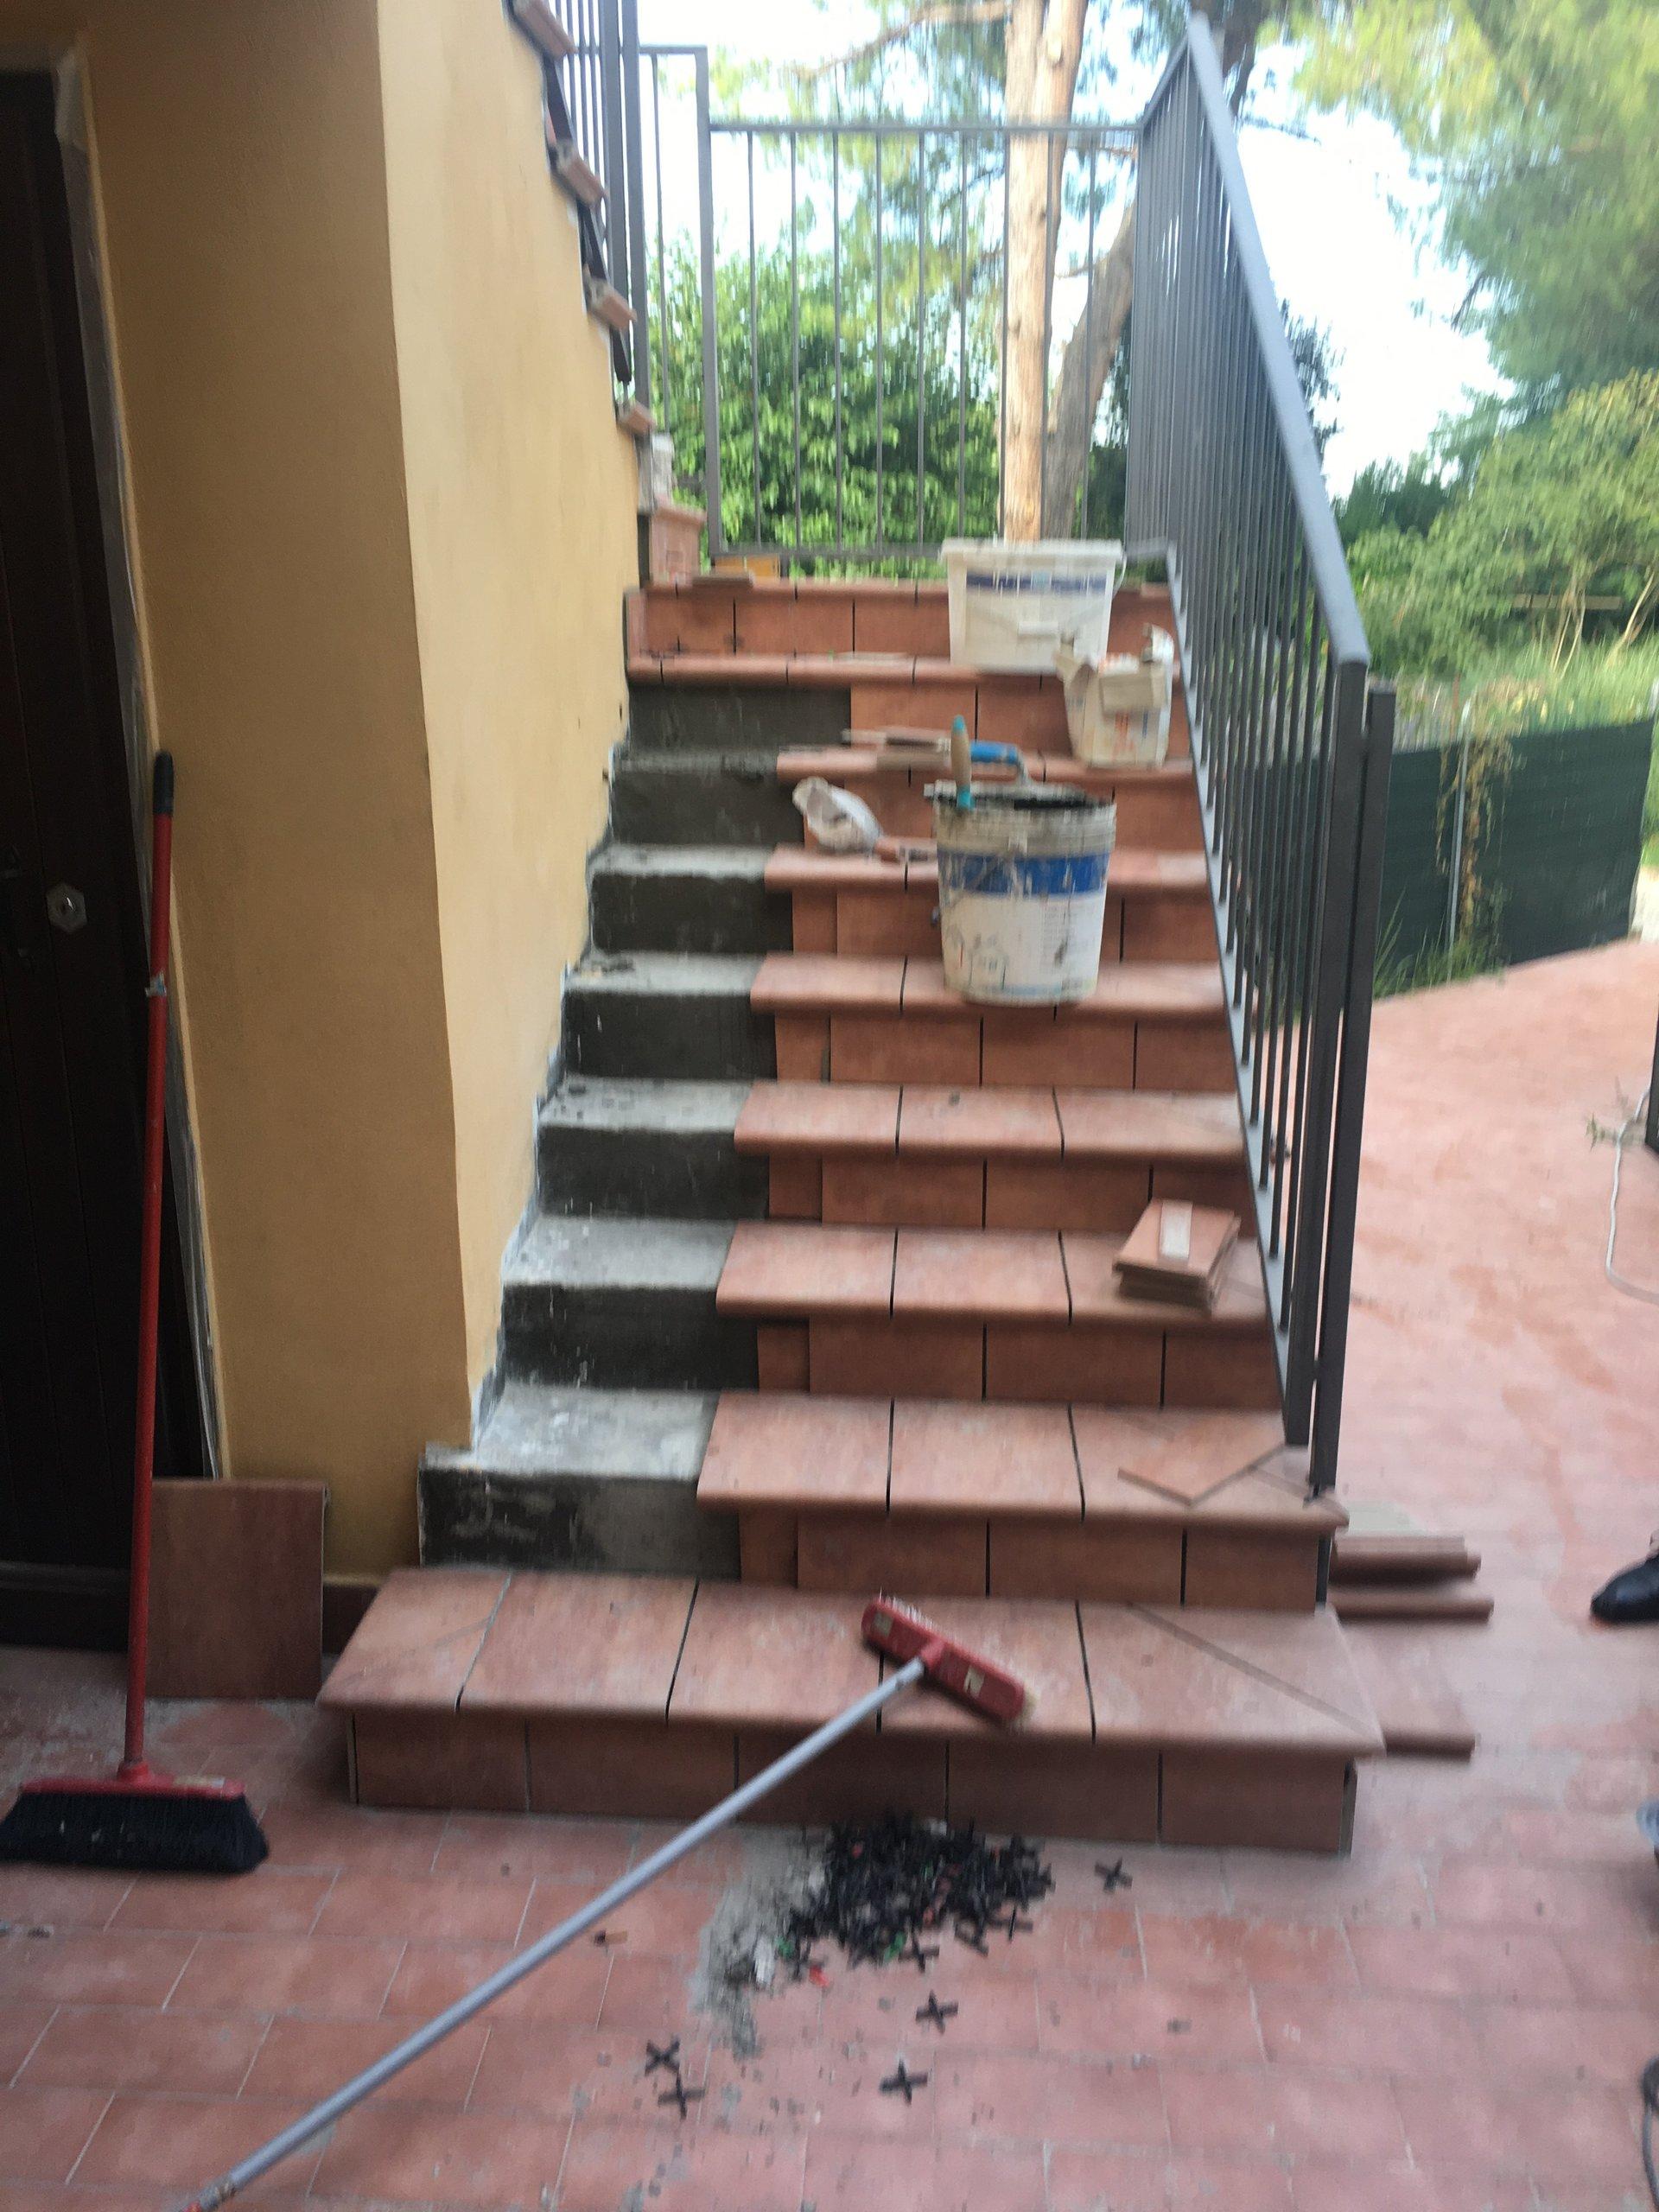 Rifacimento terrazze - Bologna - Kola Impresa Edile